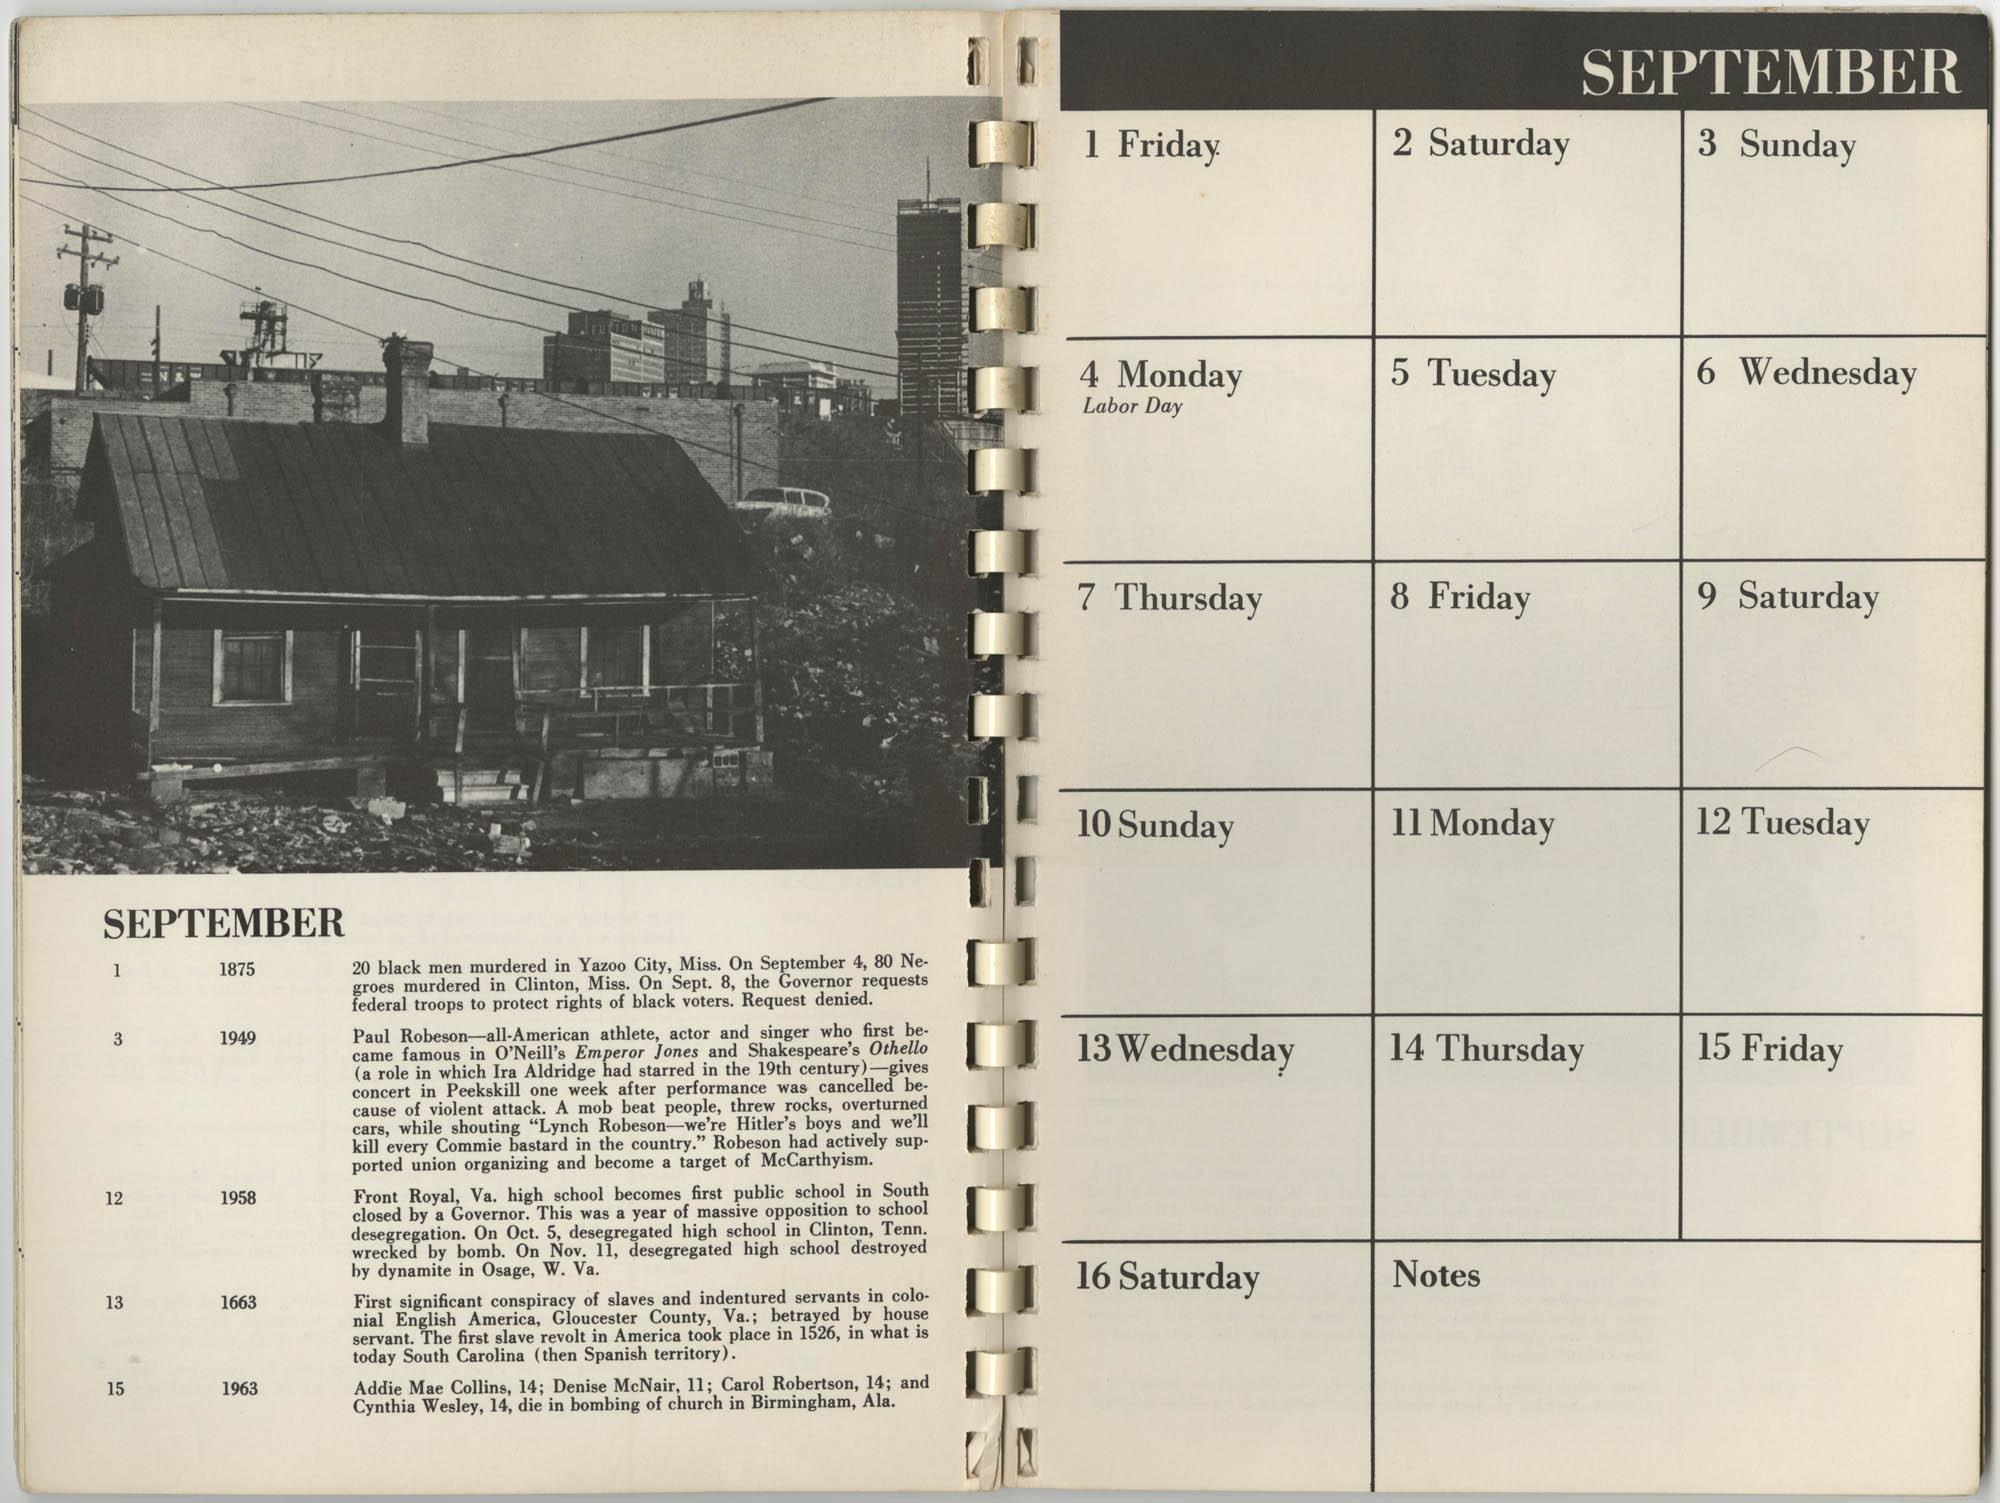 1967 SNCC Calendar, September 1-16